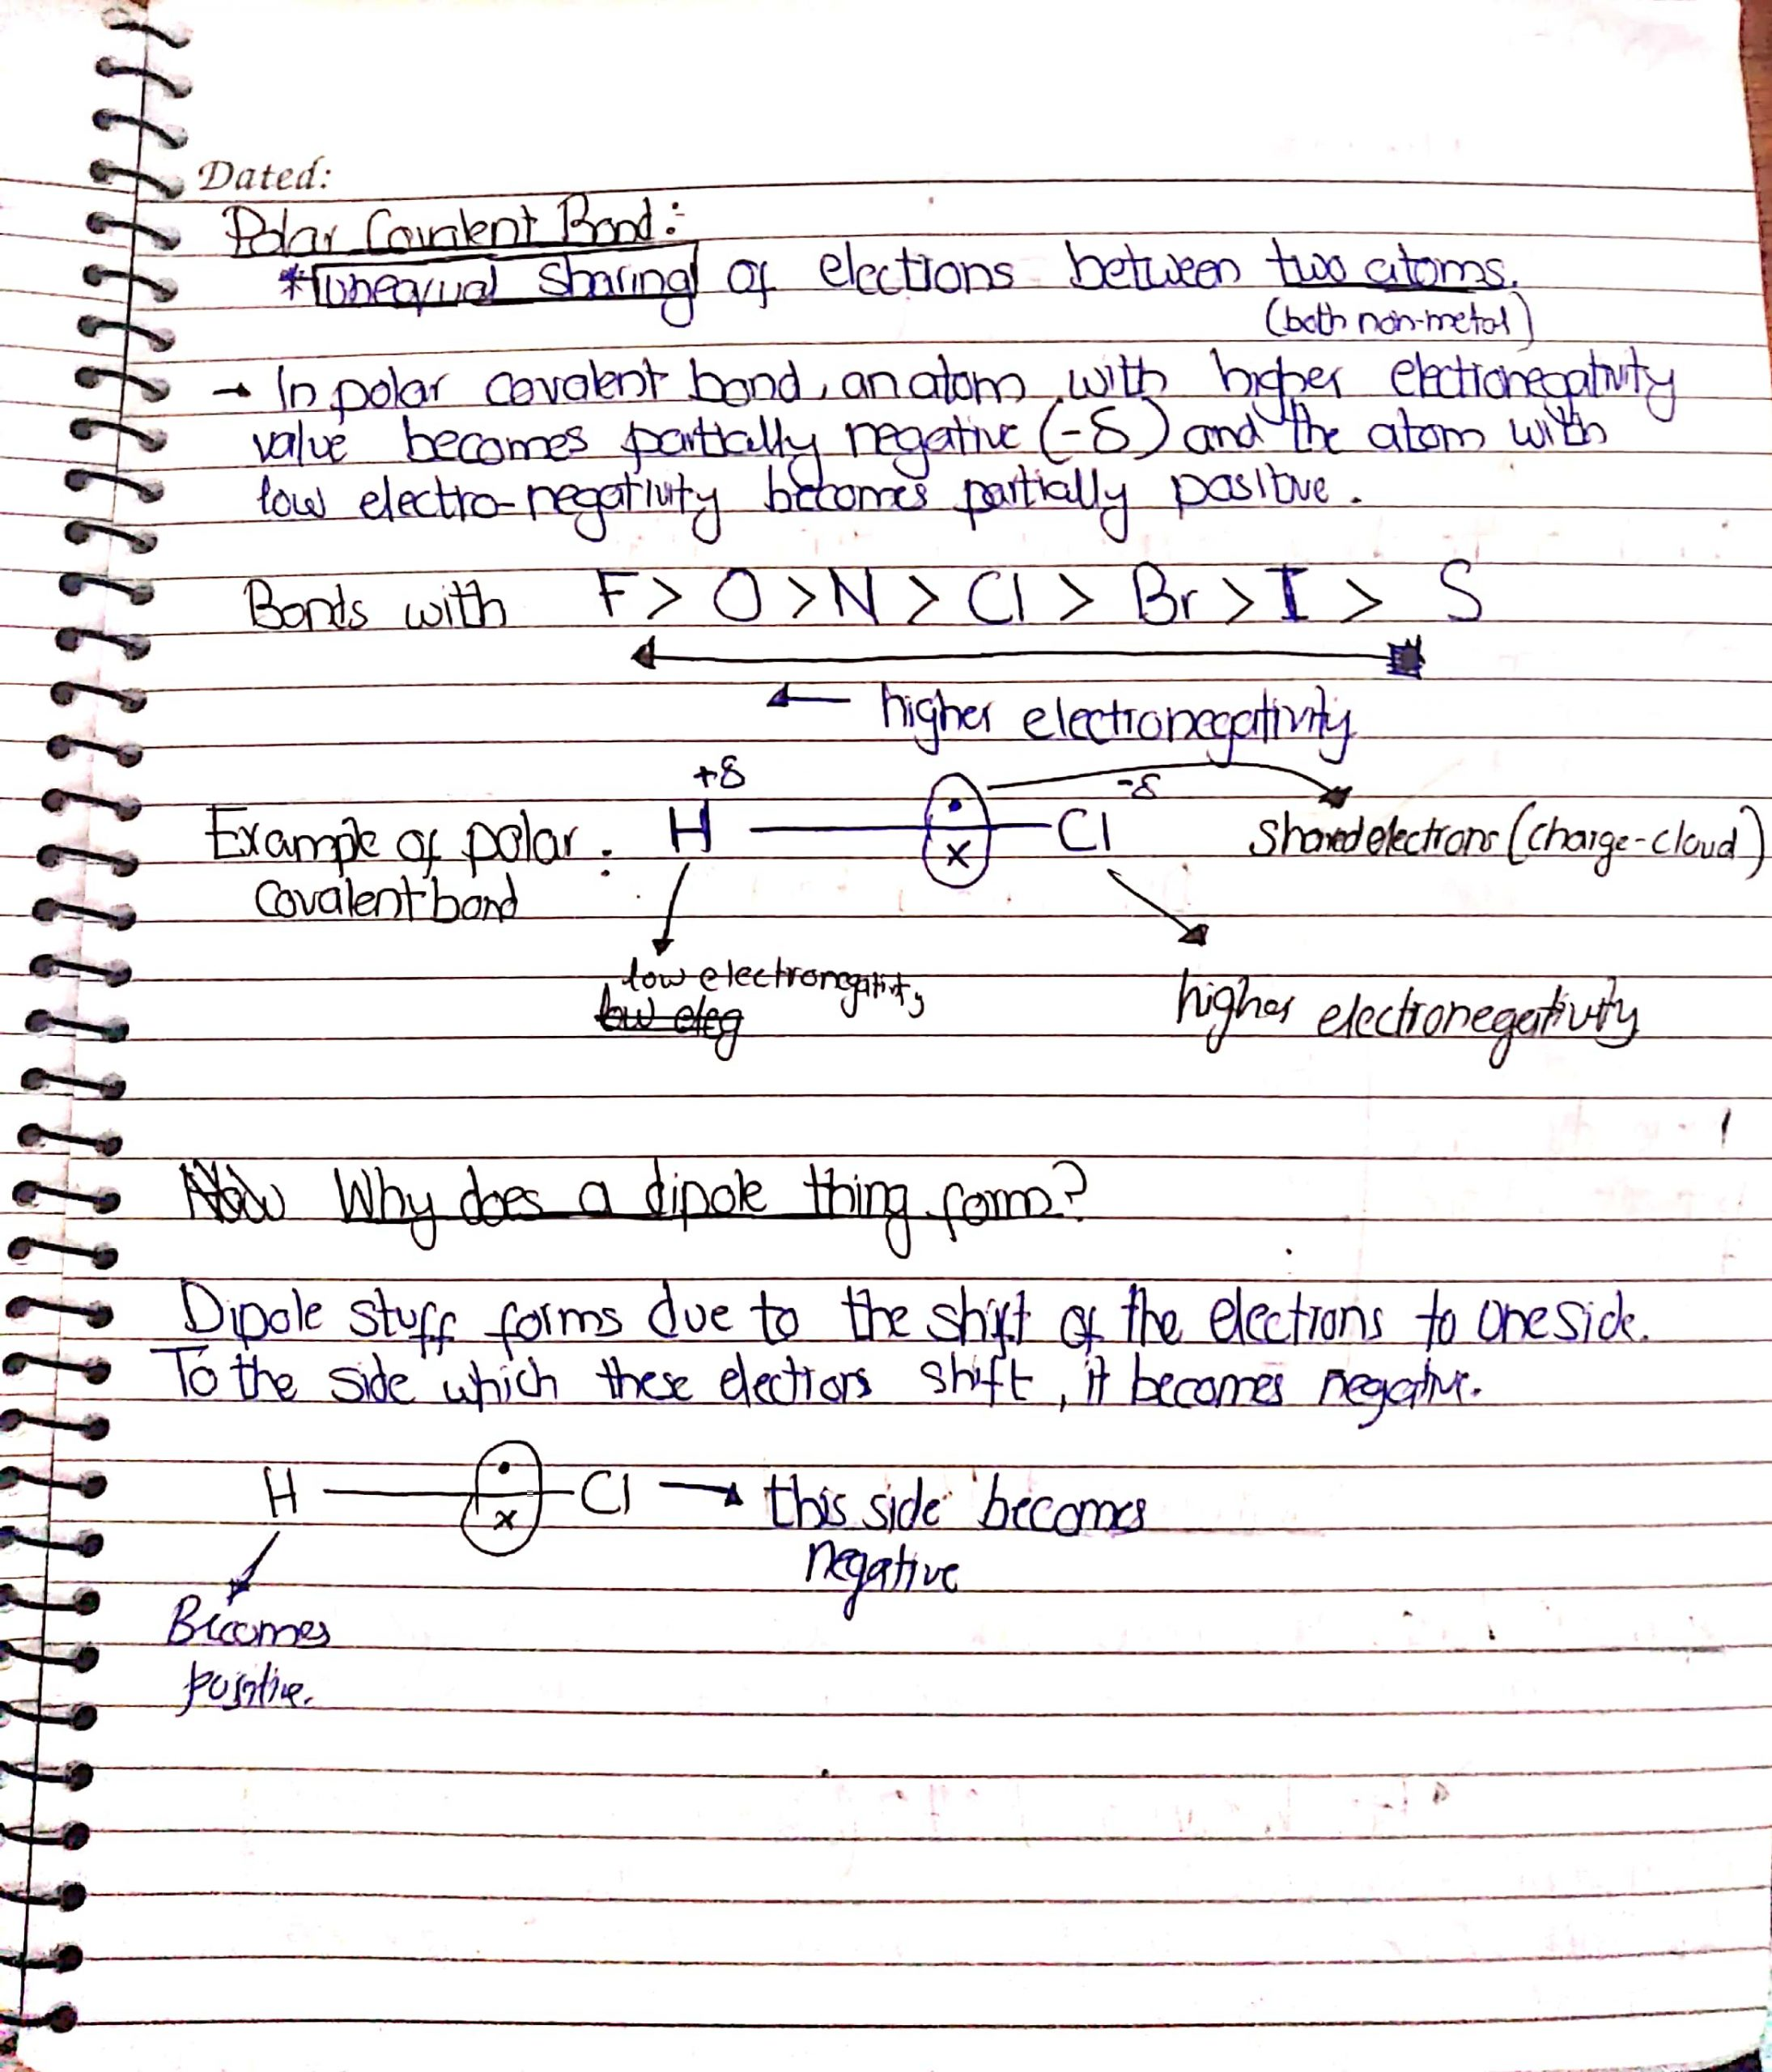 chemical bonding Sir Kashif_10